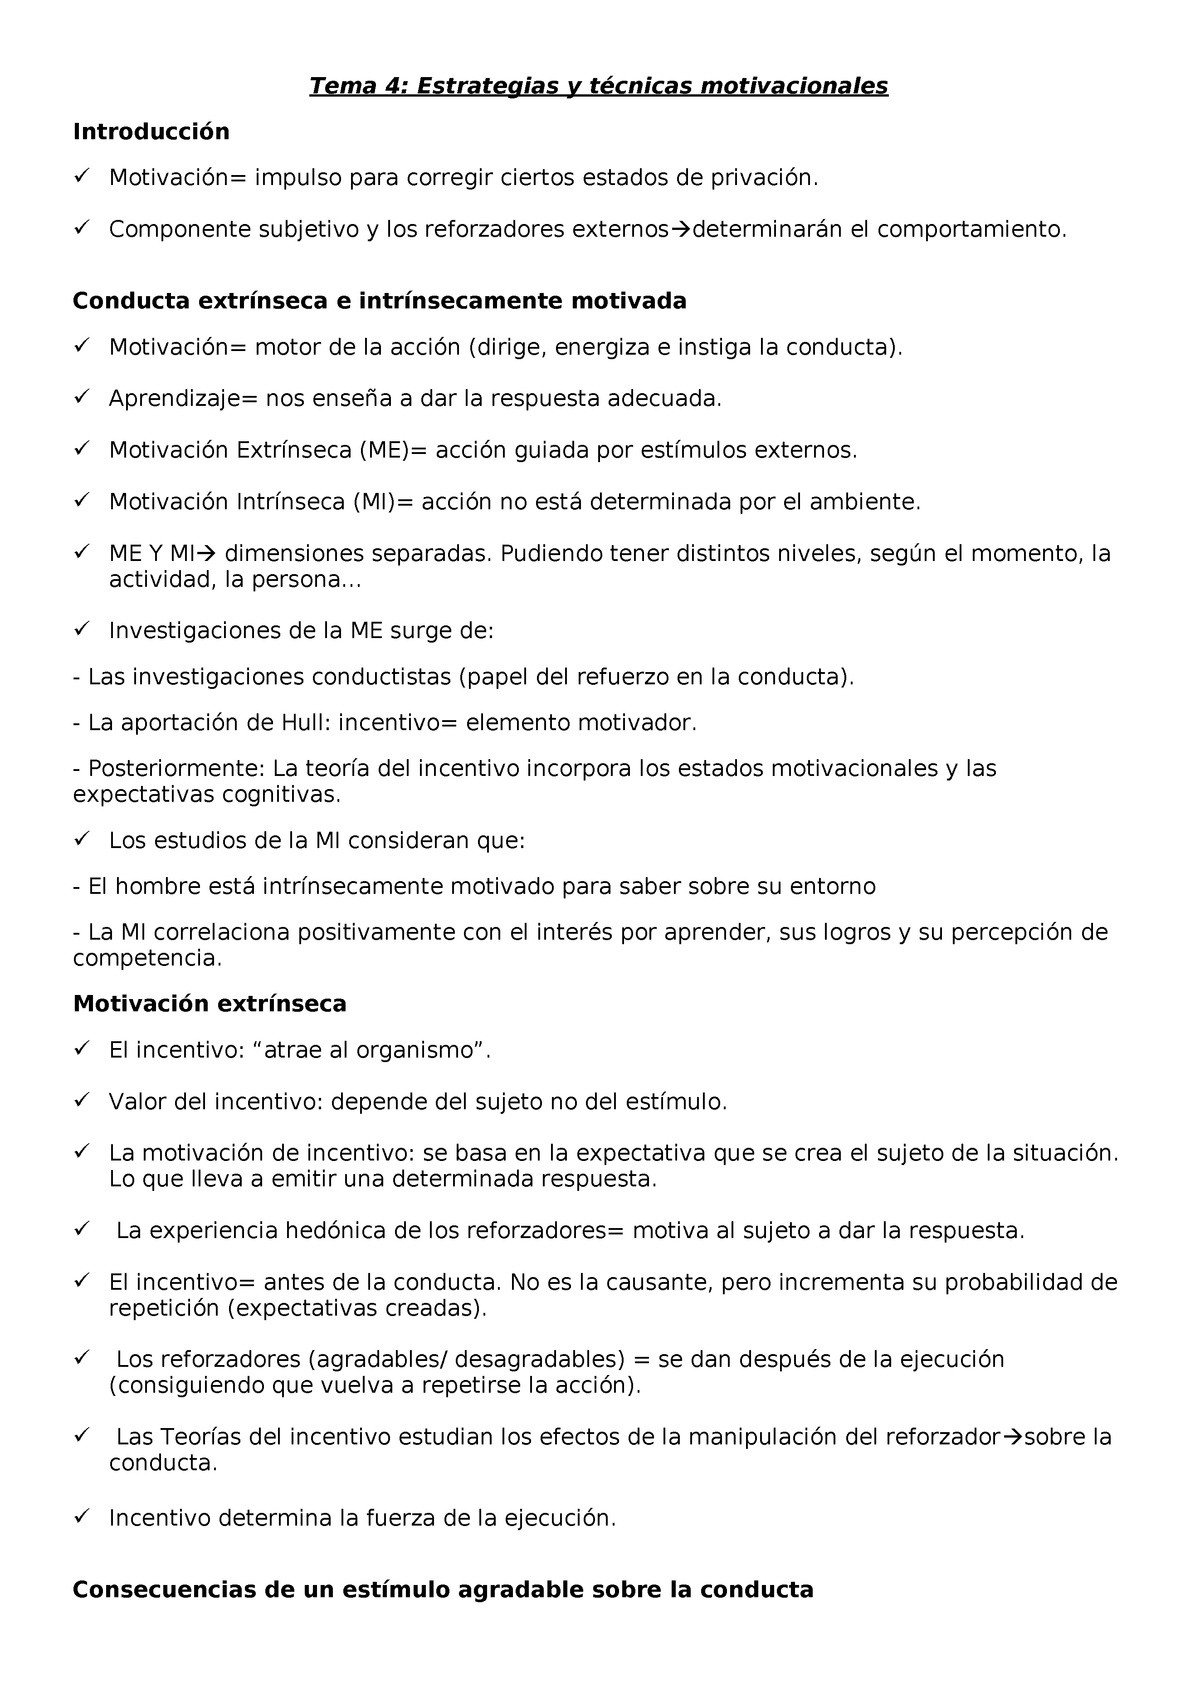 Tema 4a Estrategias Motivacionales 800144 Ucm Studocu